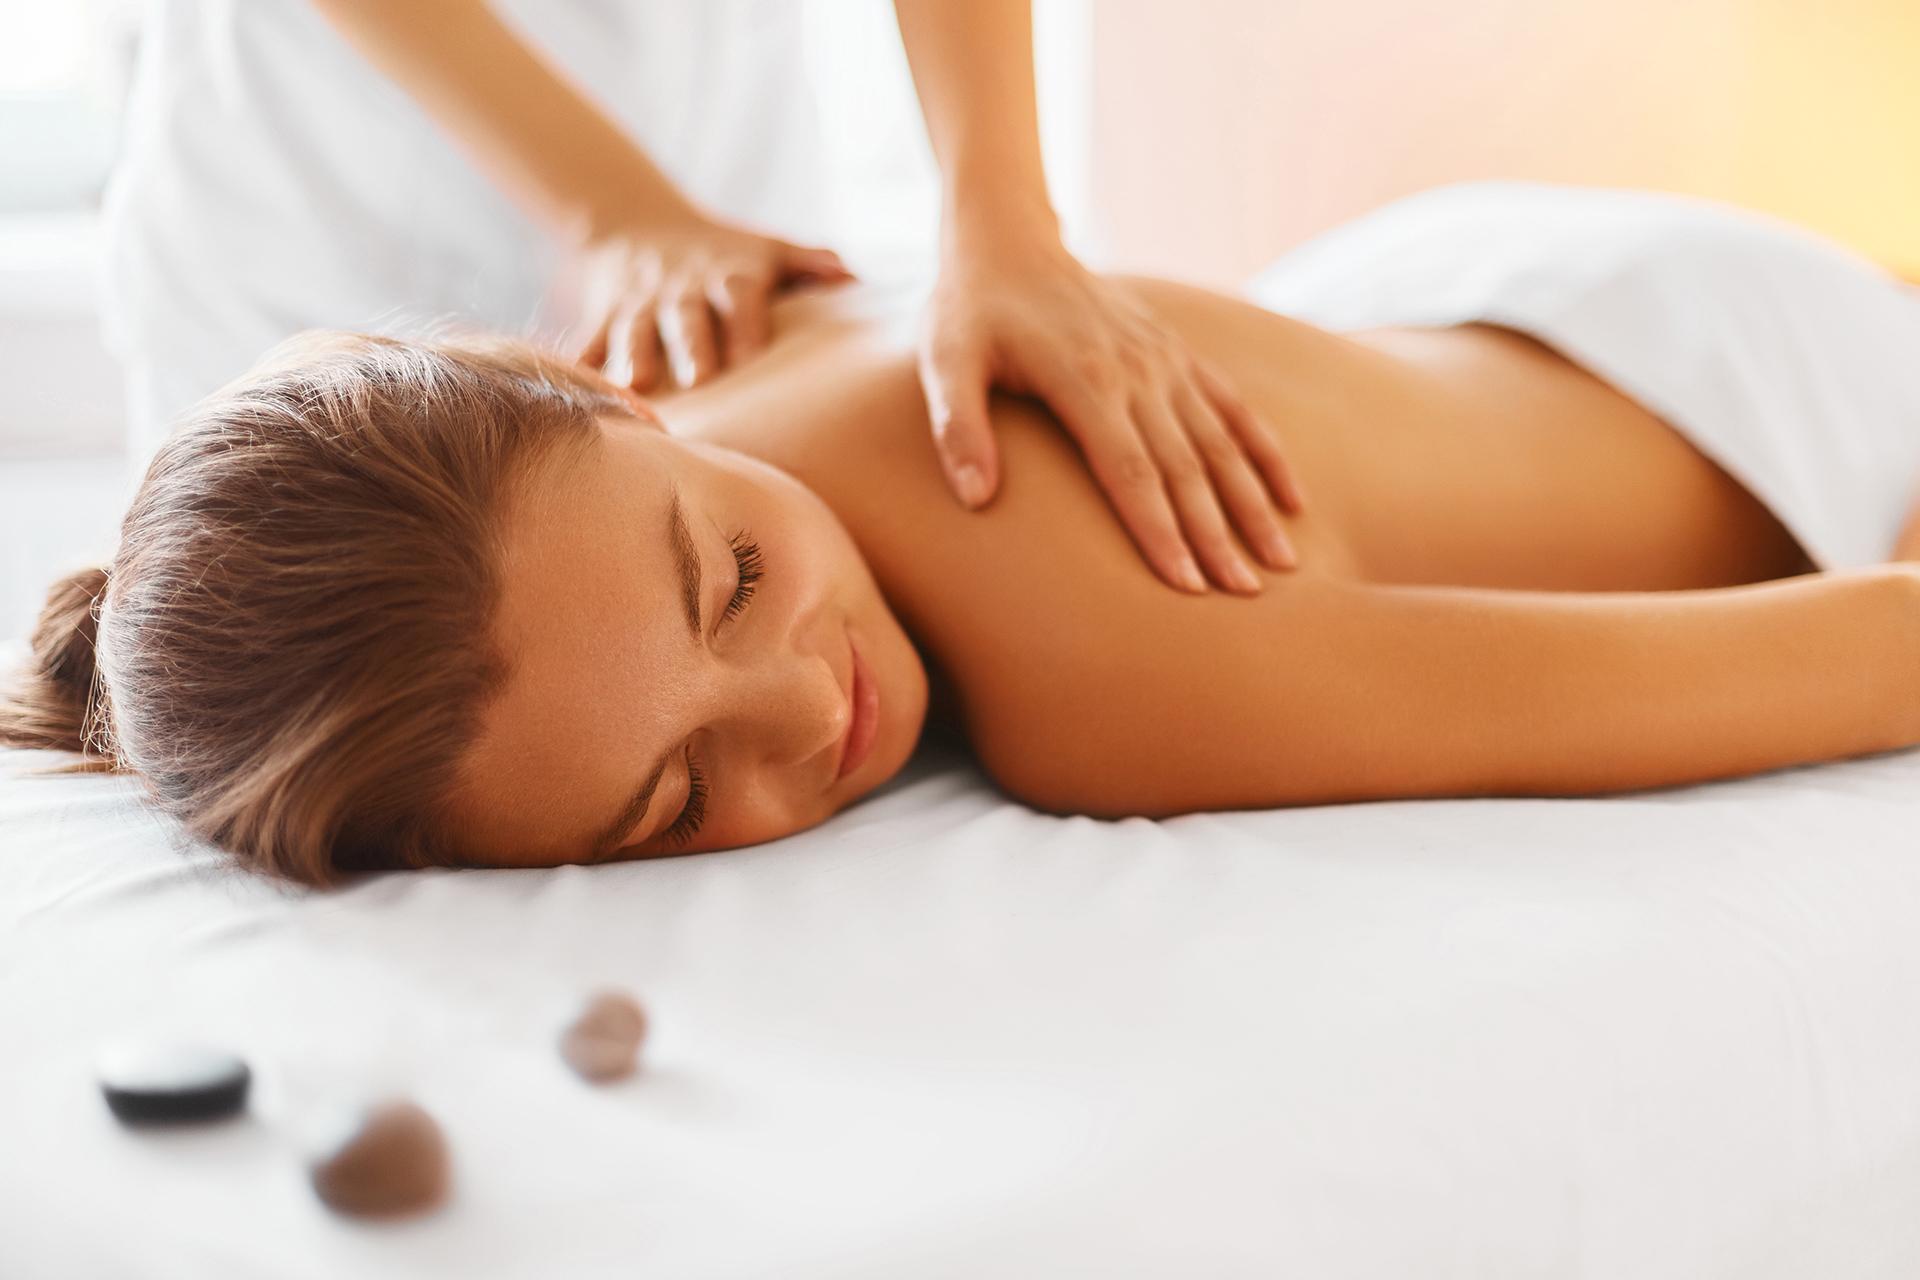 wellness hotel nordtyskland massage odder